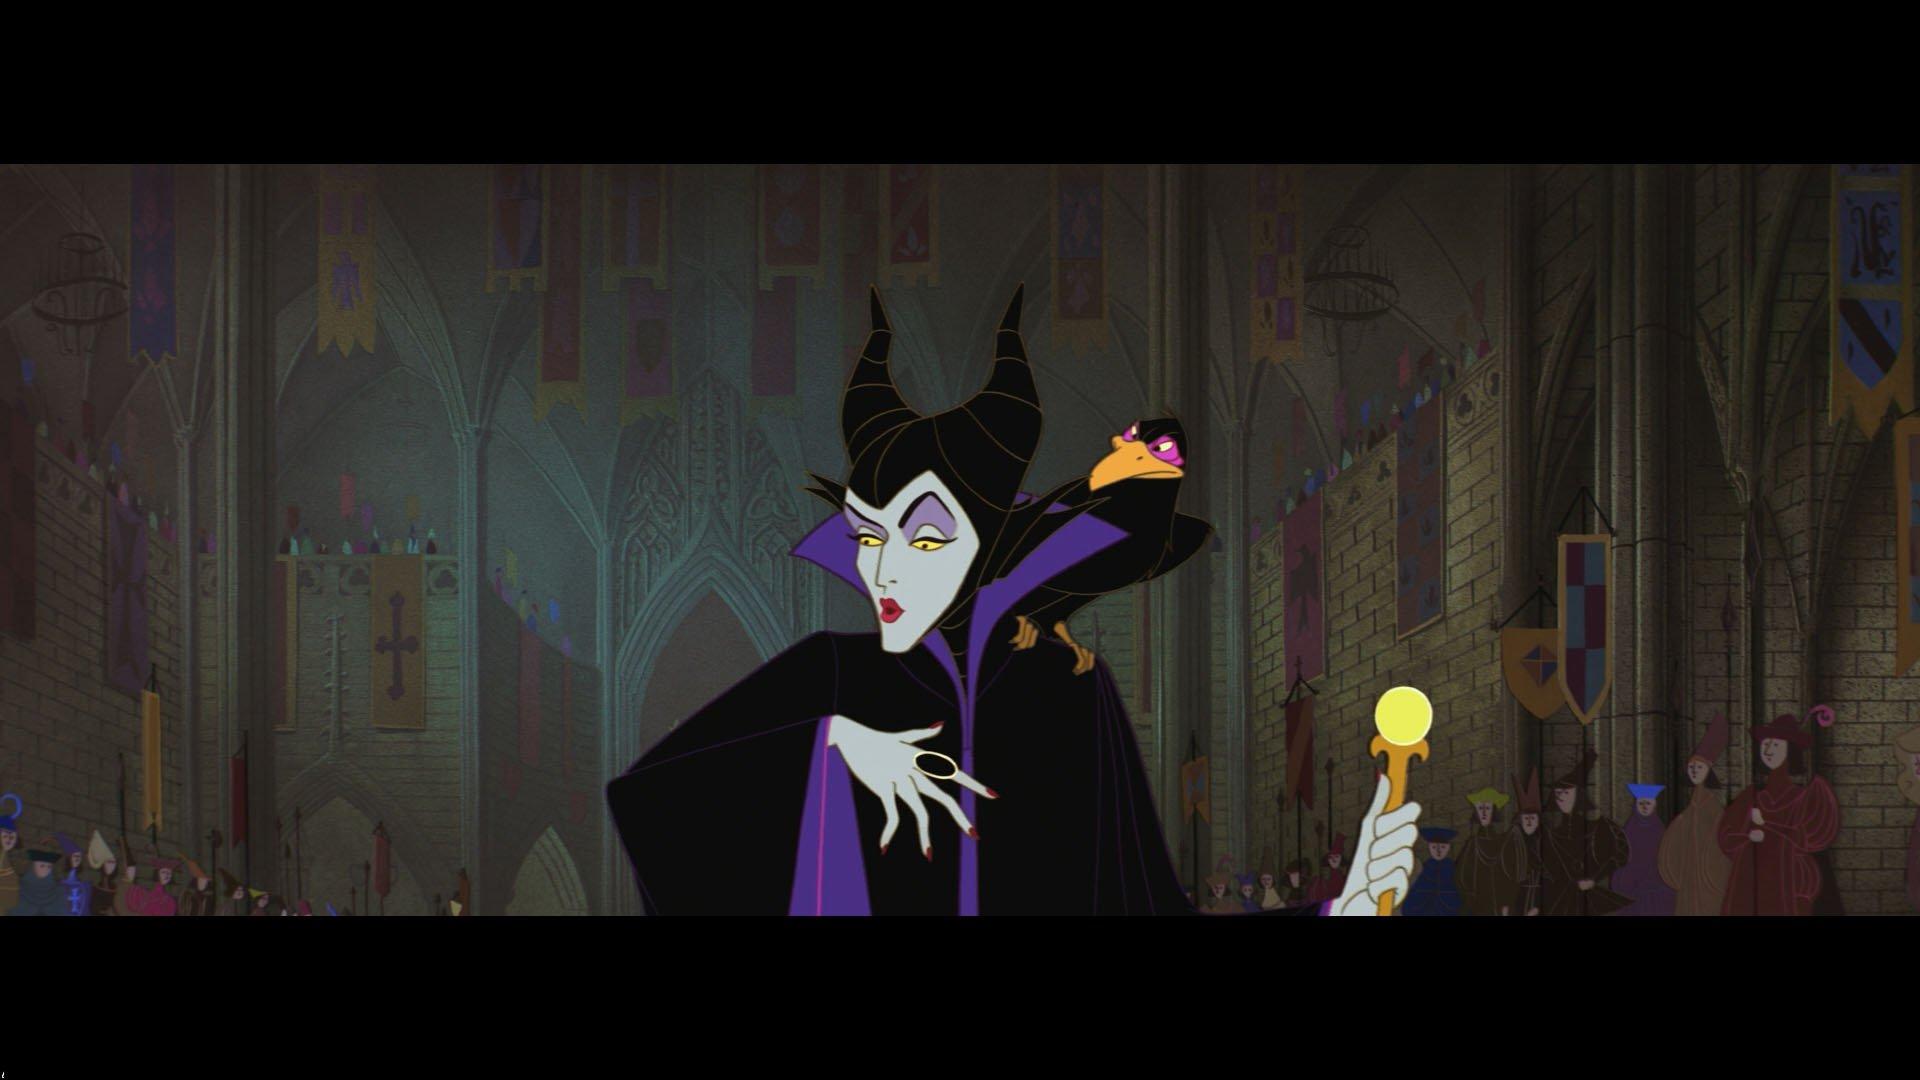 Disney Company Sleeping Beauty Maleficent wallpaper background 1920x1080